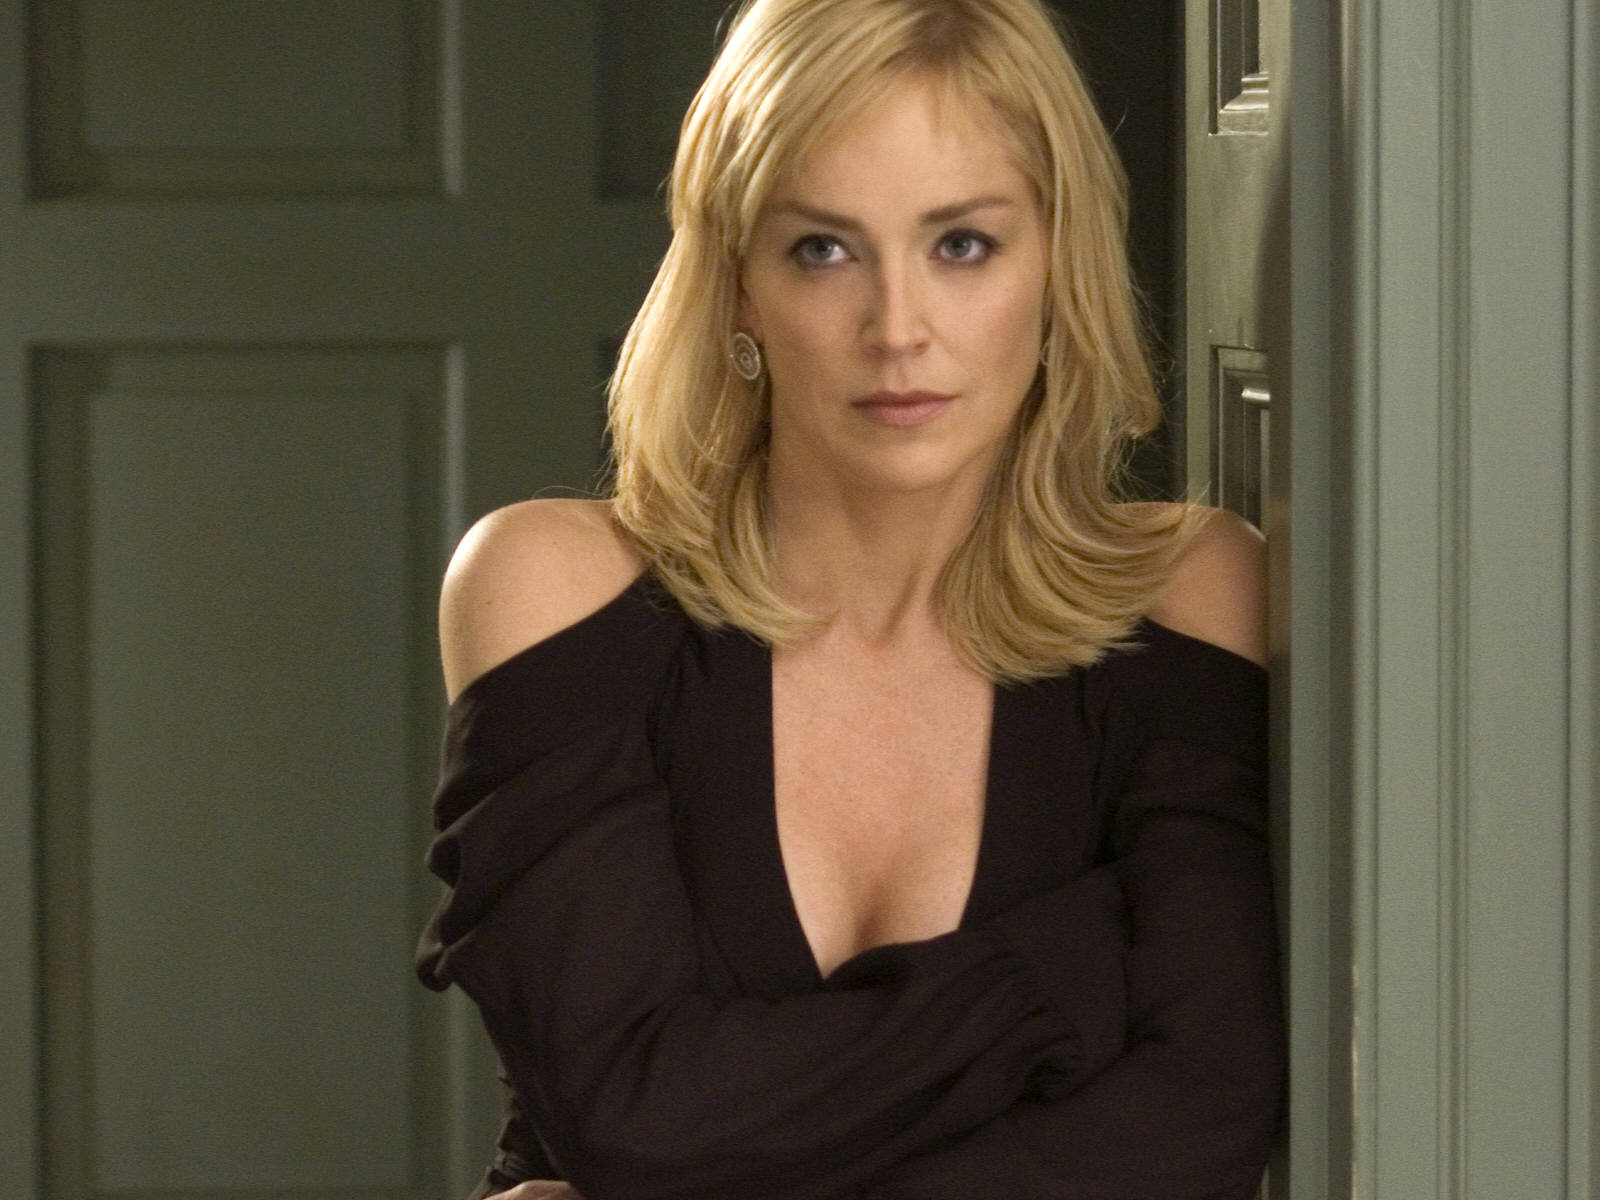 sharon stone actress - photo #17